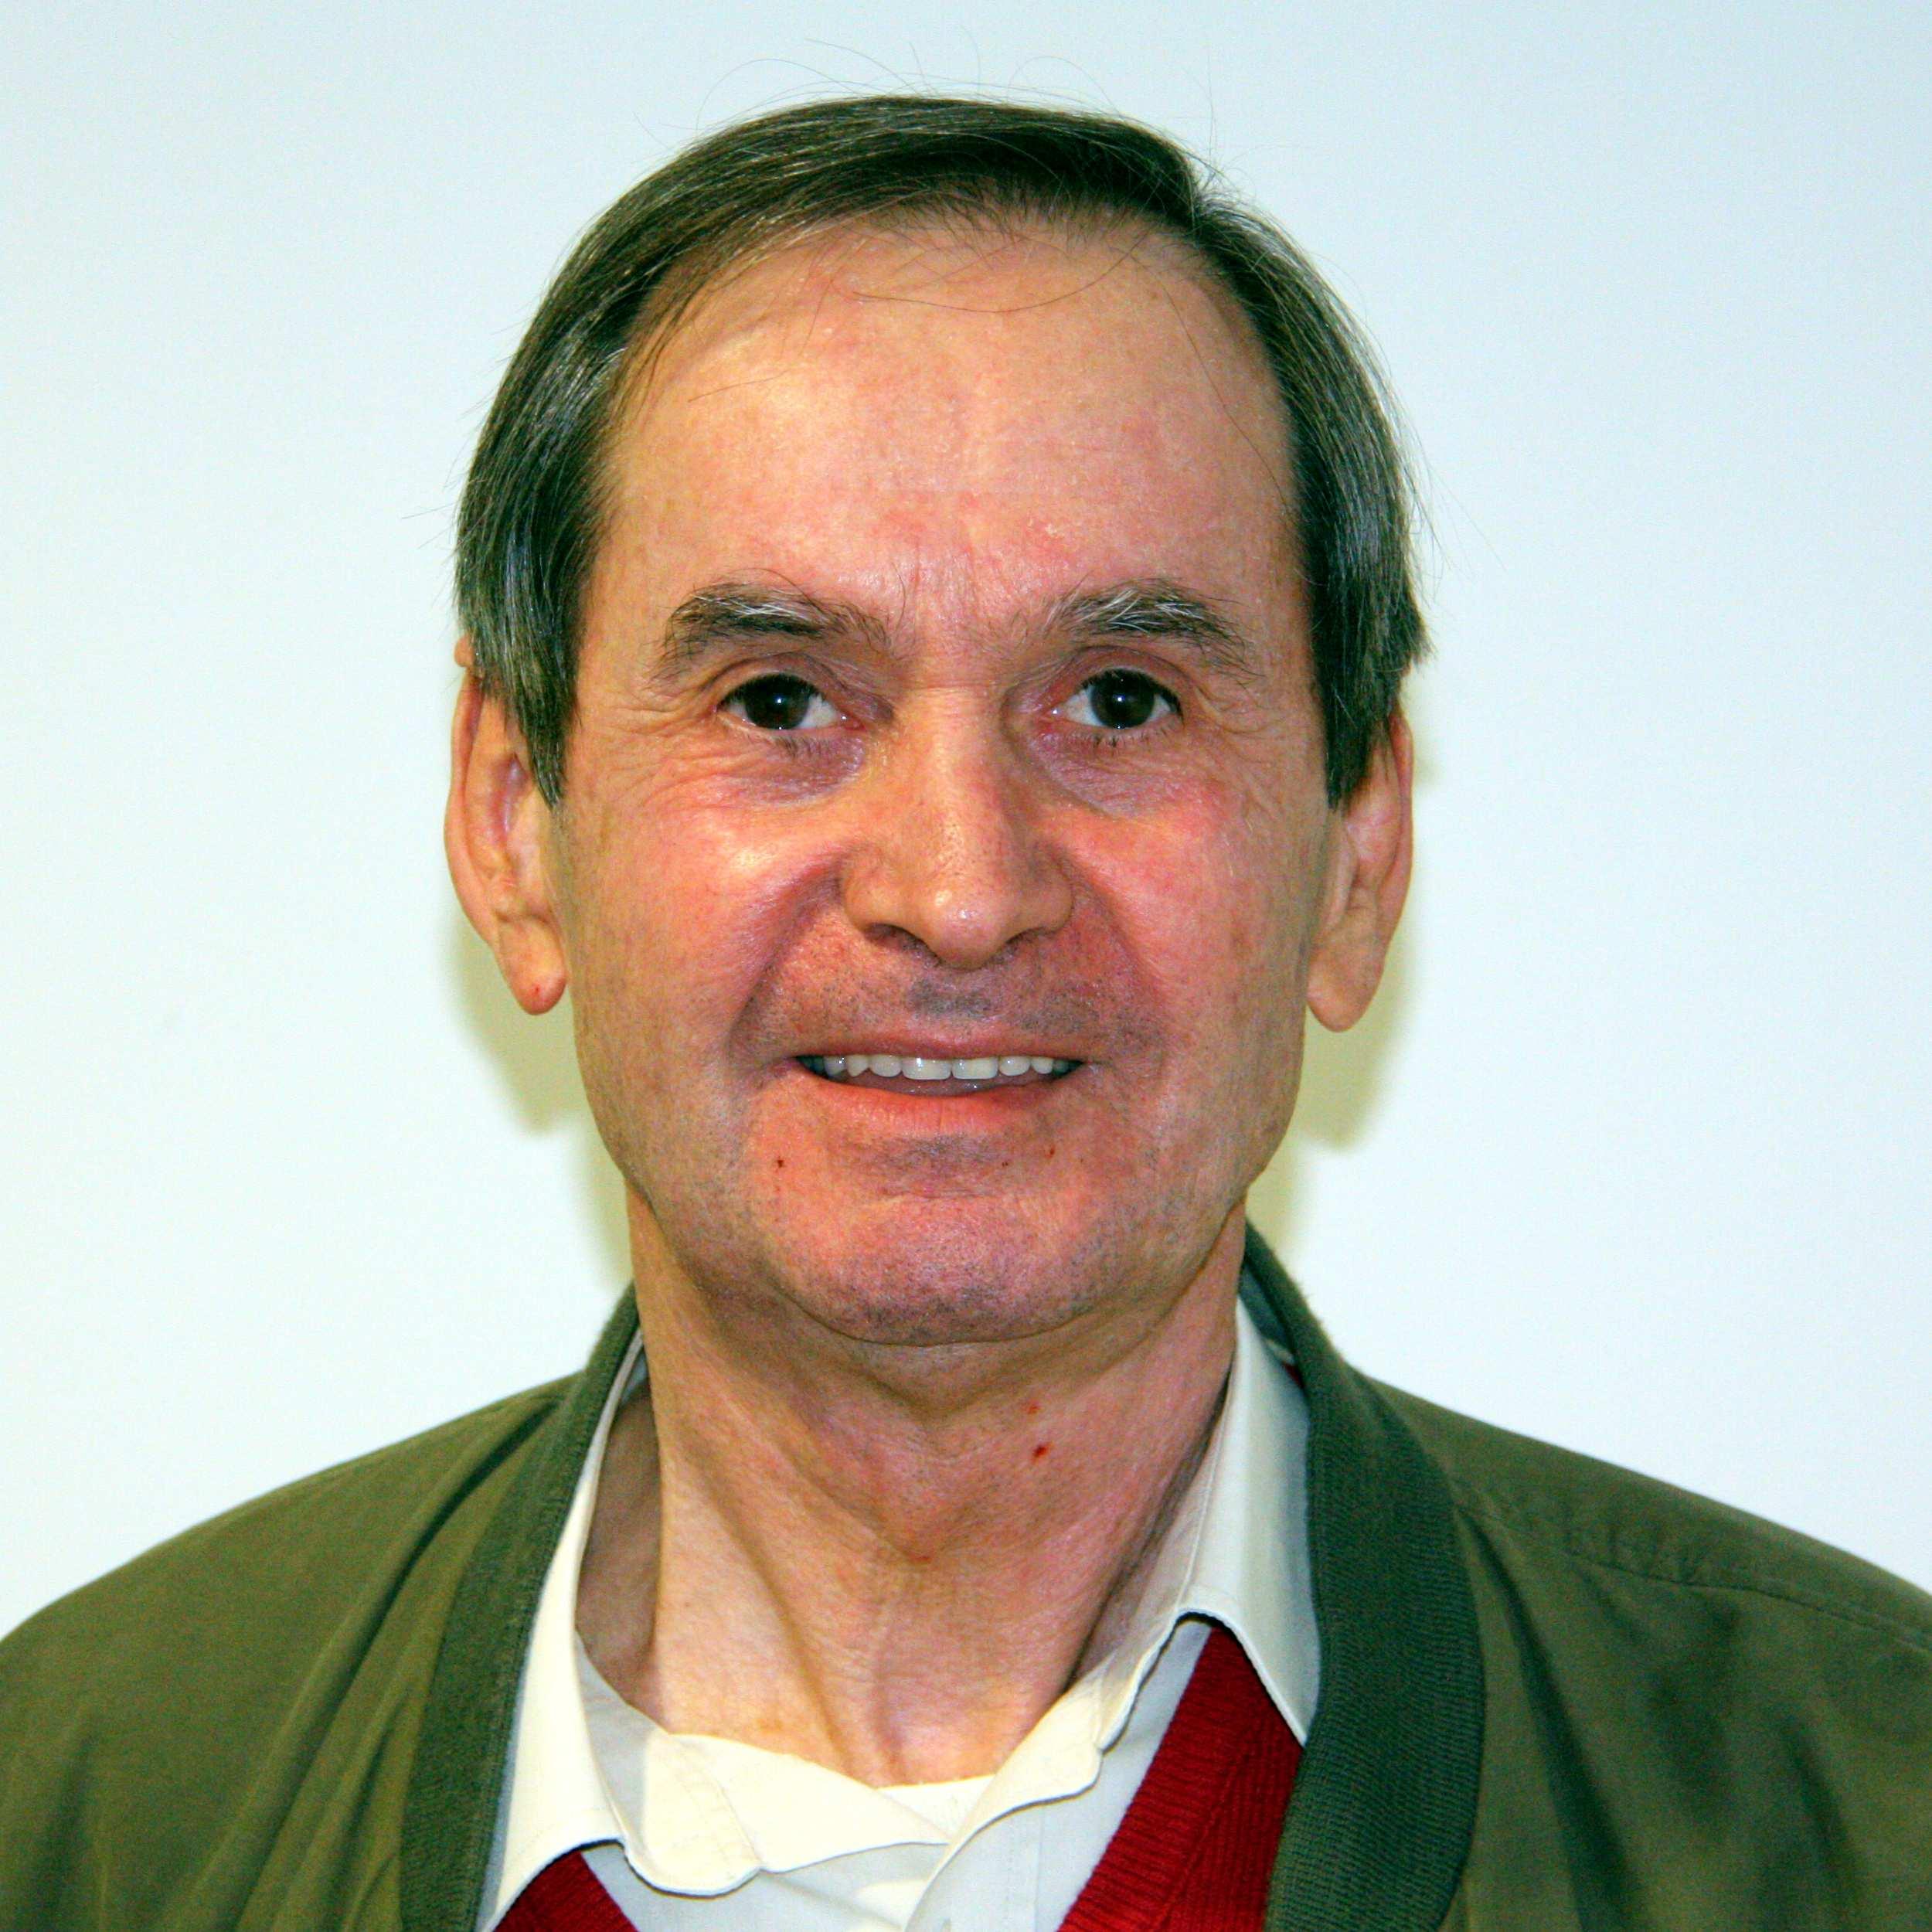 Jean-Claude Madaule